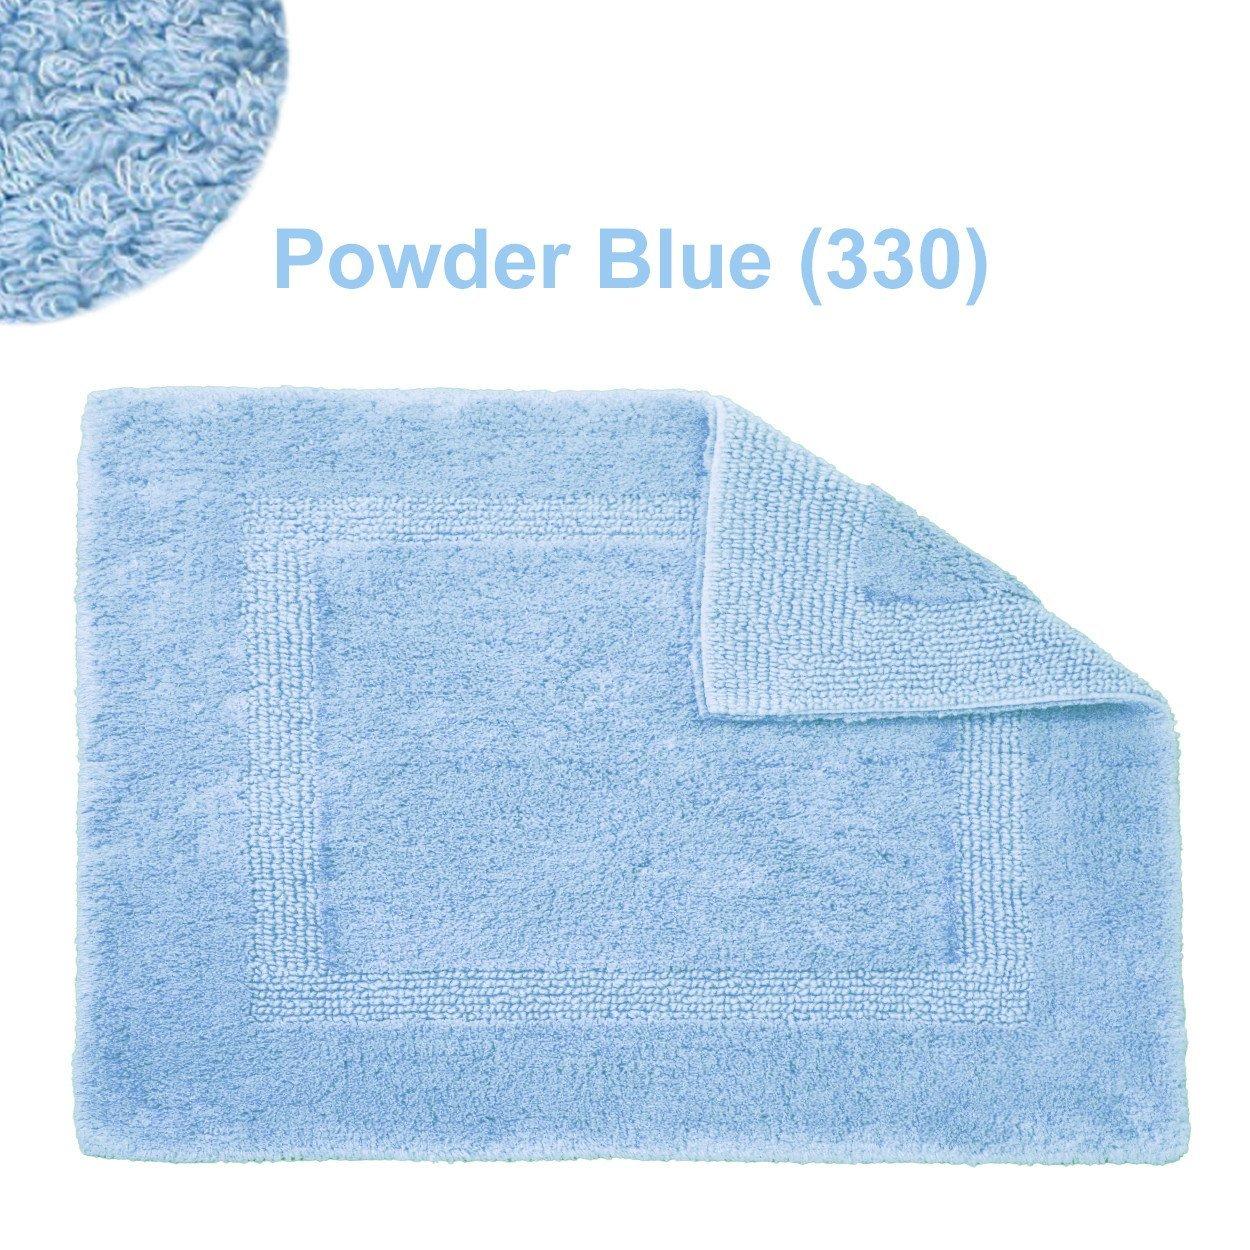 Abyss & Habidecor.- Alfombra de baño modelo Reversible 70x120 cm Powder Blue 330